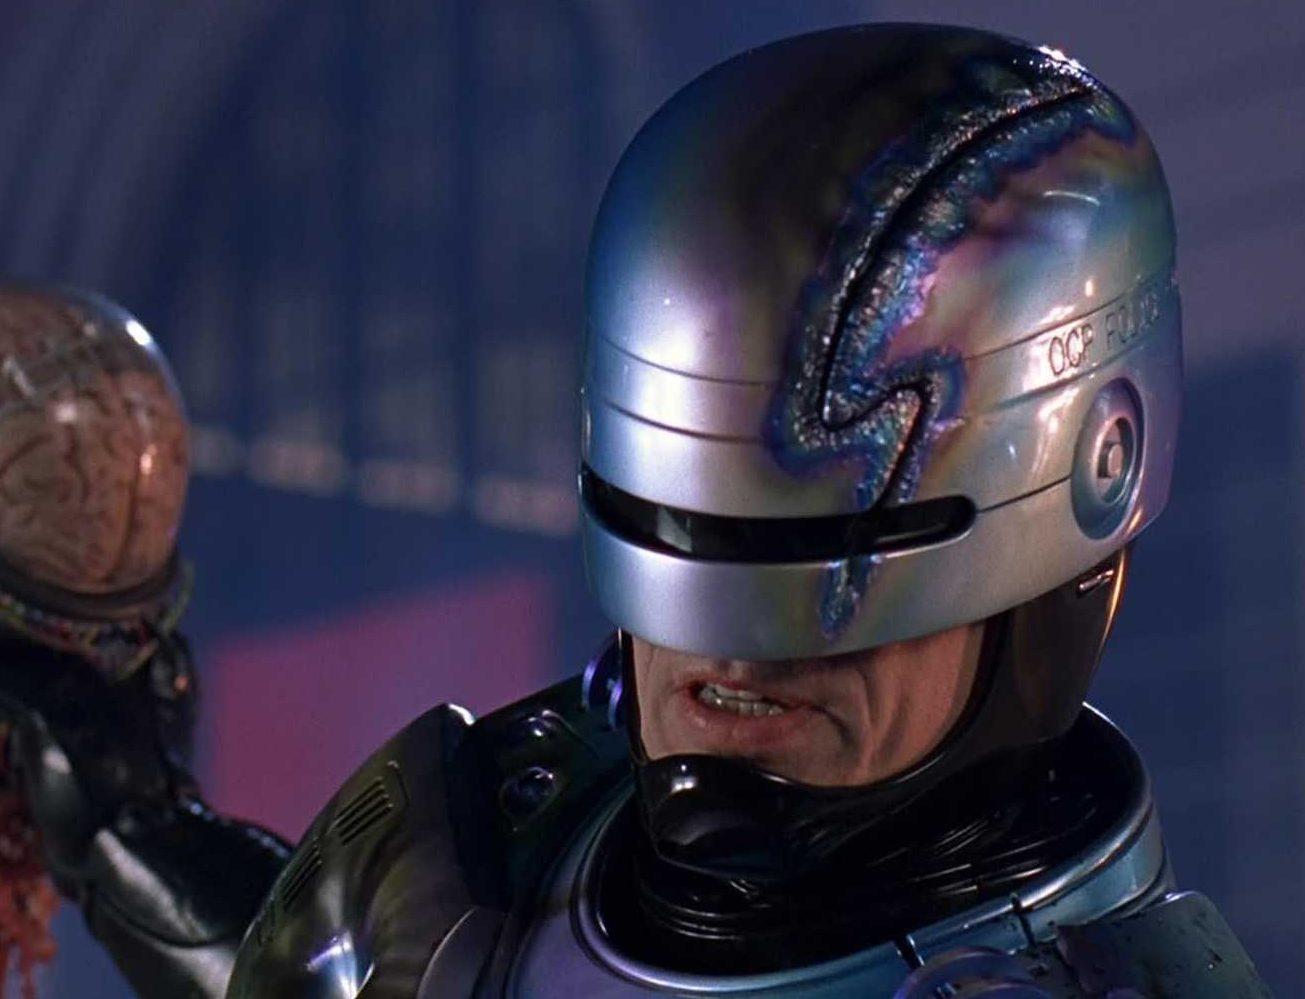 pkuf3xajNzDPzAXtvGNNhs59XBL e1607443964464 20 Futuristic Facts About RoboCop 2